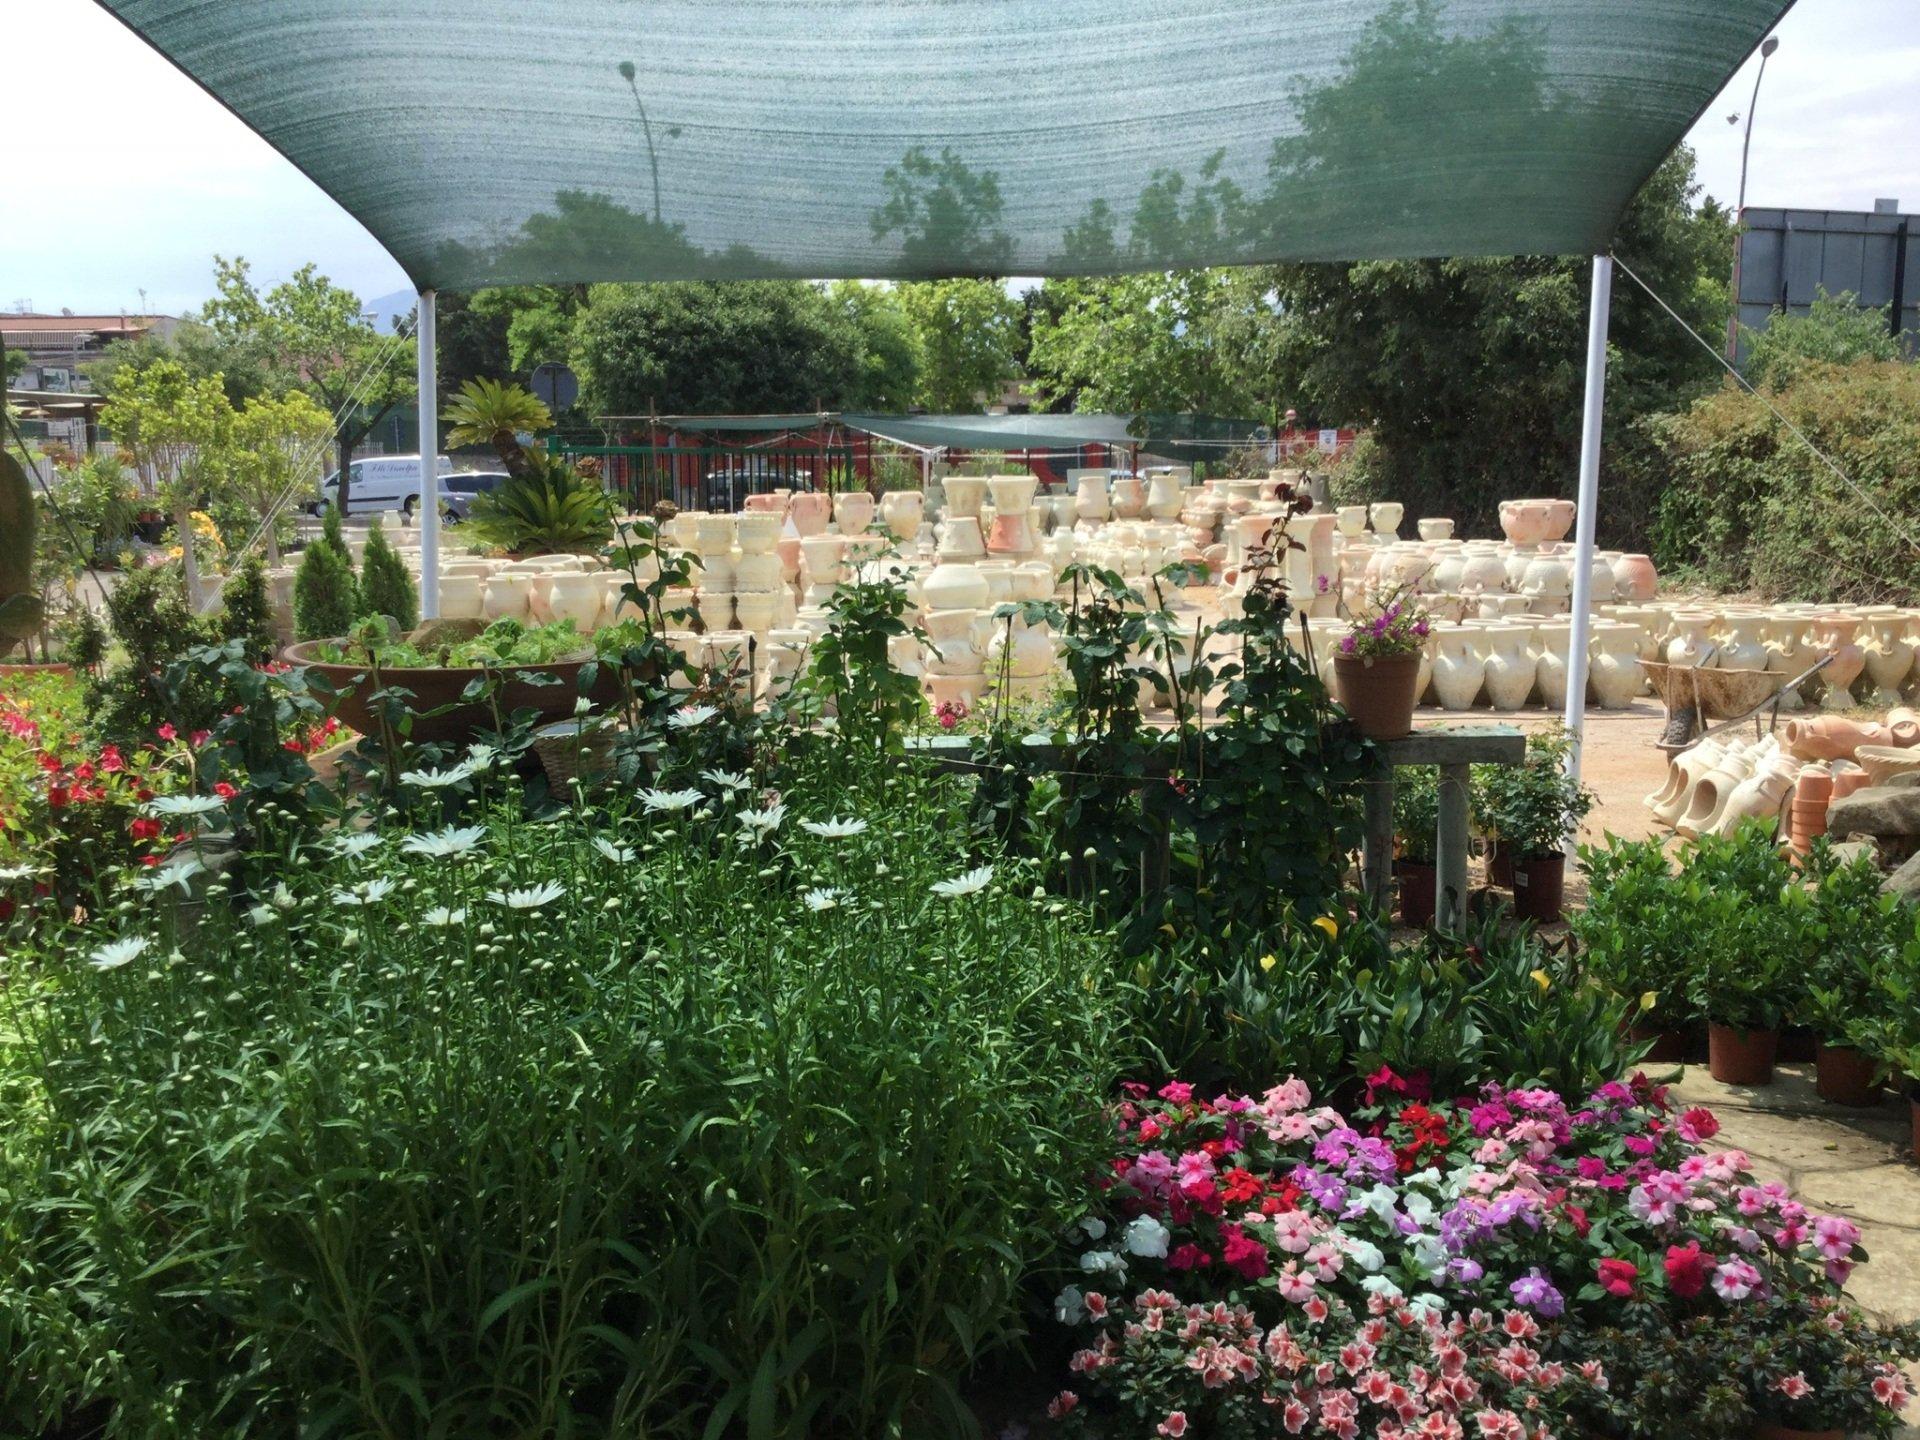 Arredo giardino palermo pa garden michelangelo for Arredo giardino palermo